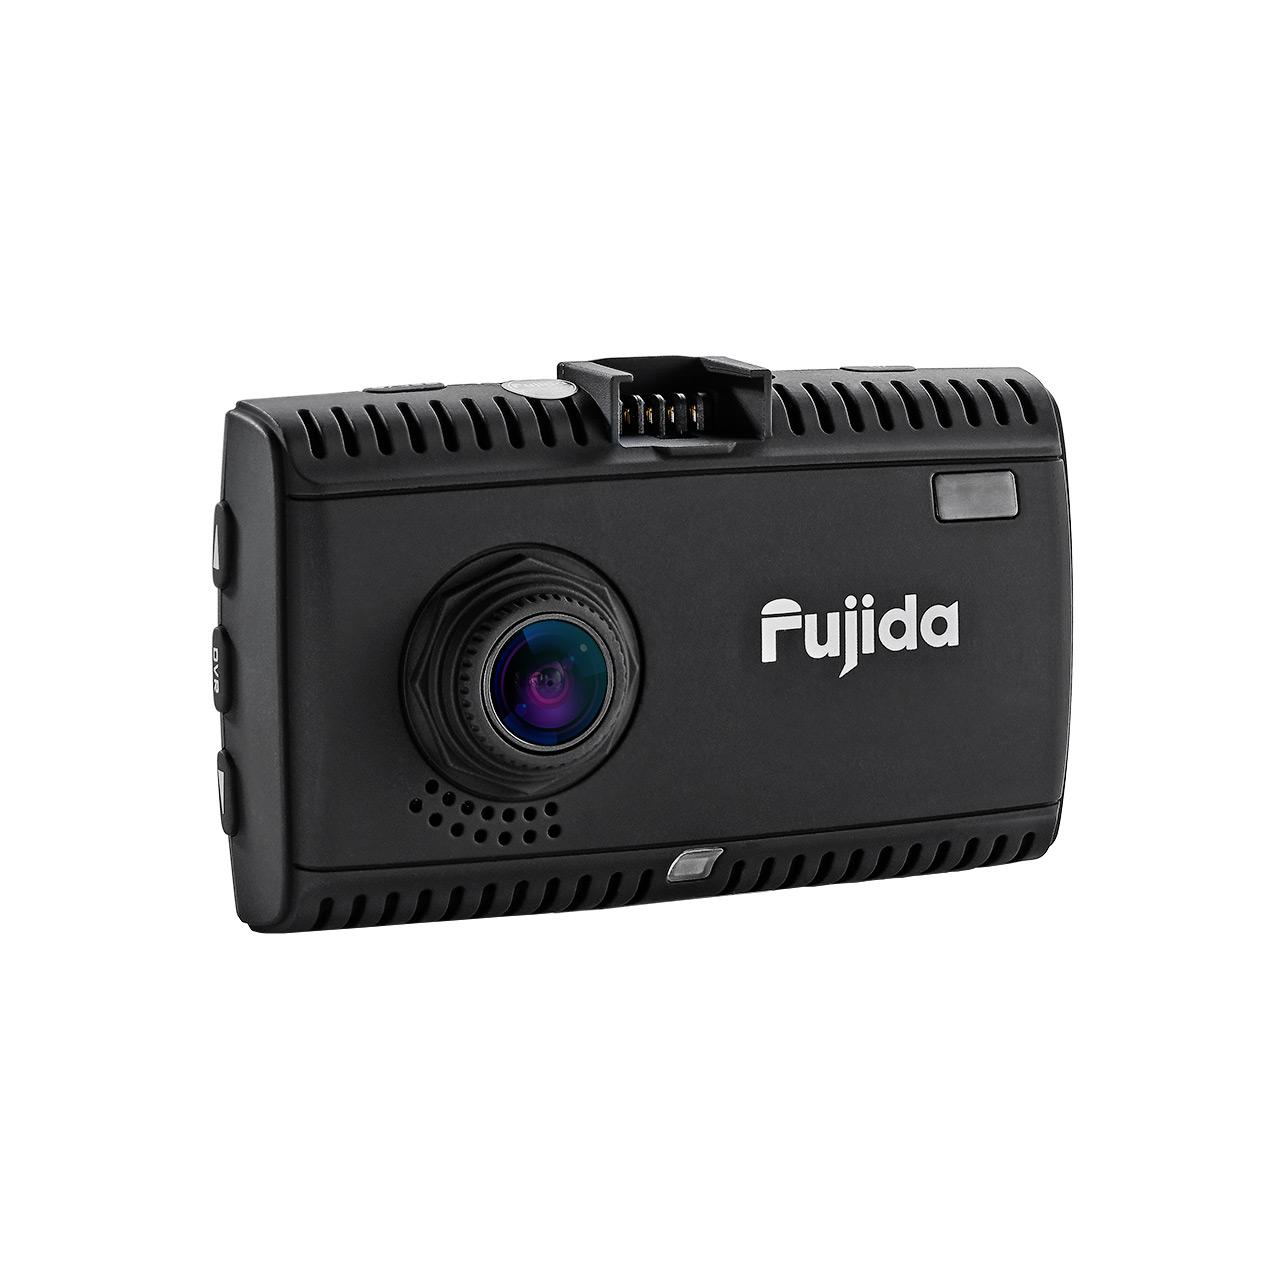 Видеорегистратор fujida karma slim wifi купить